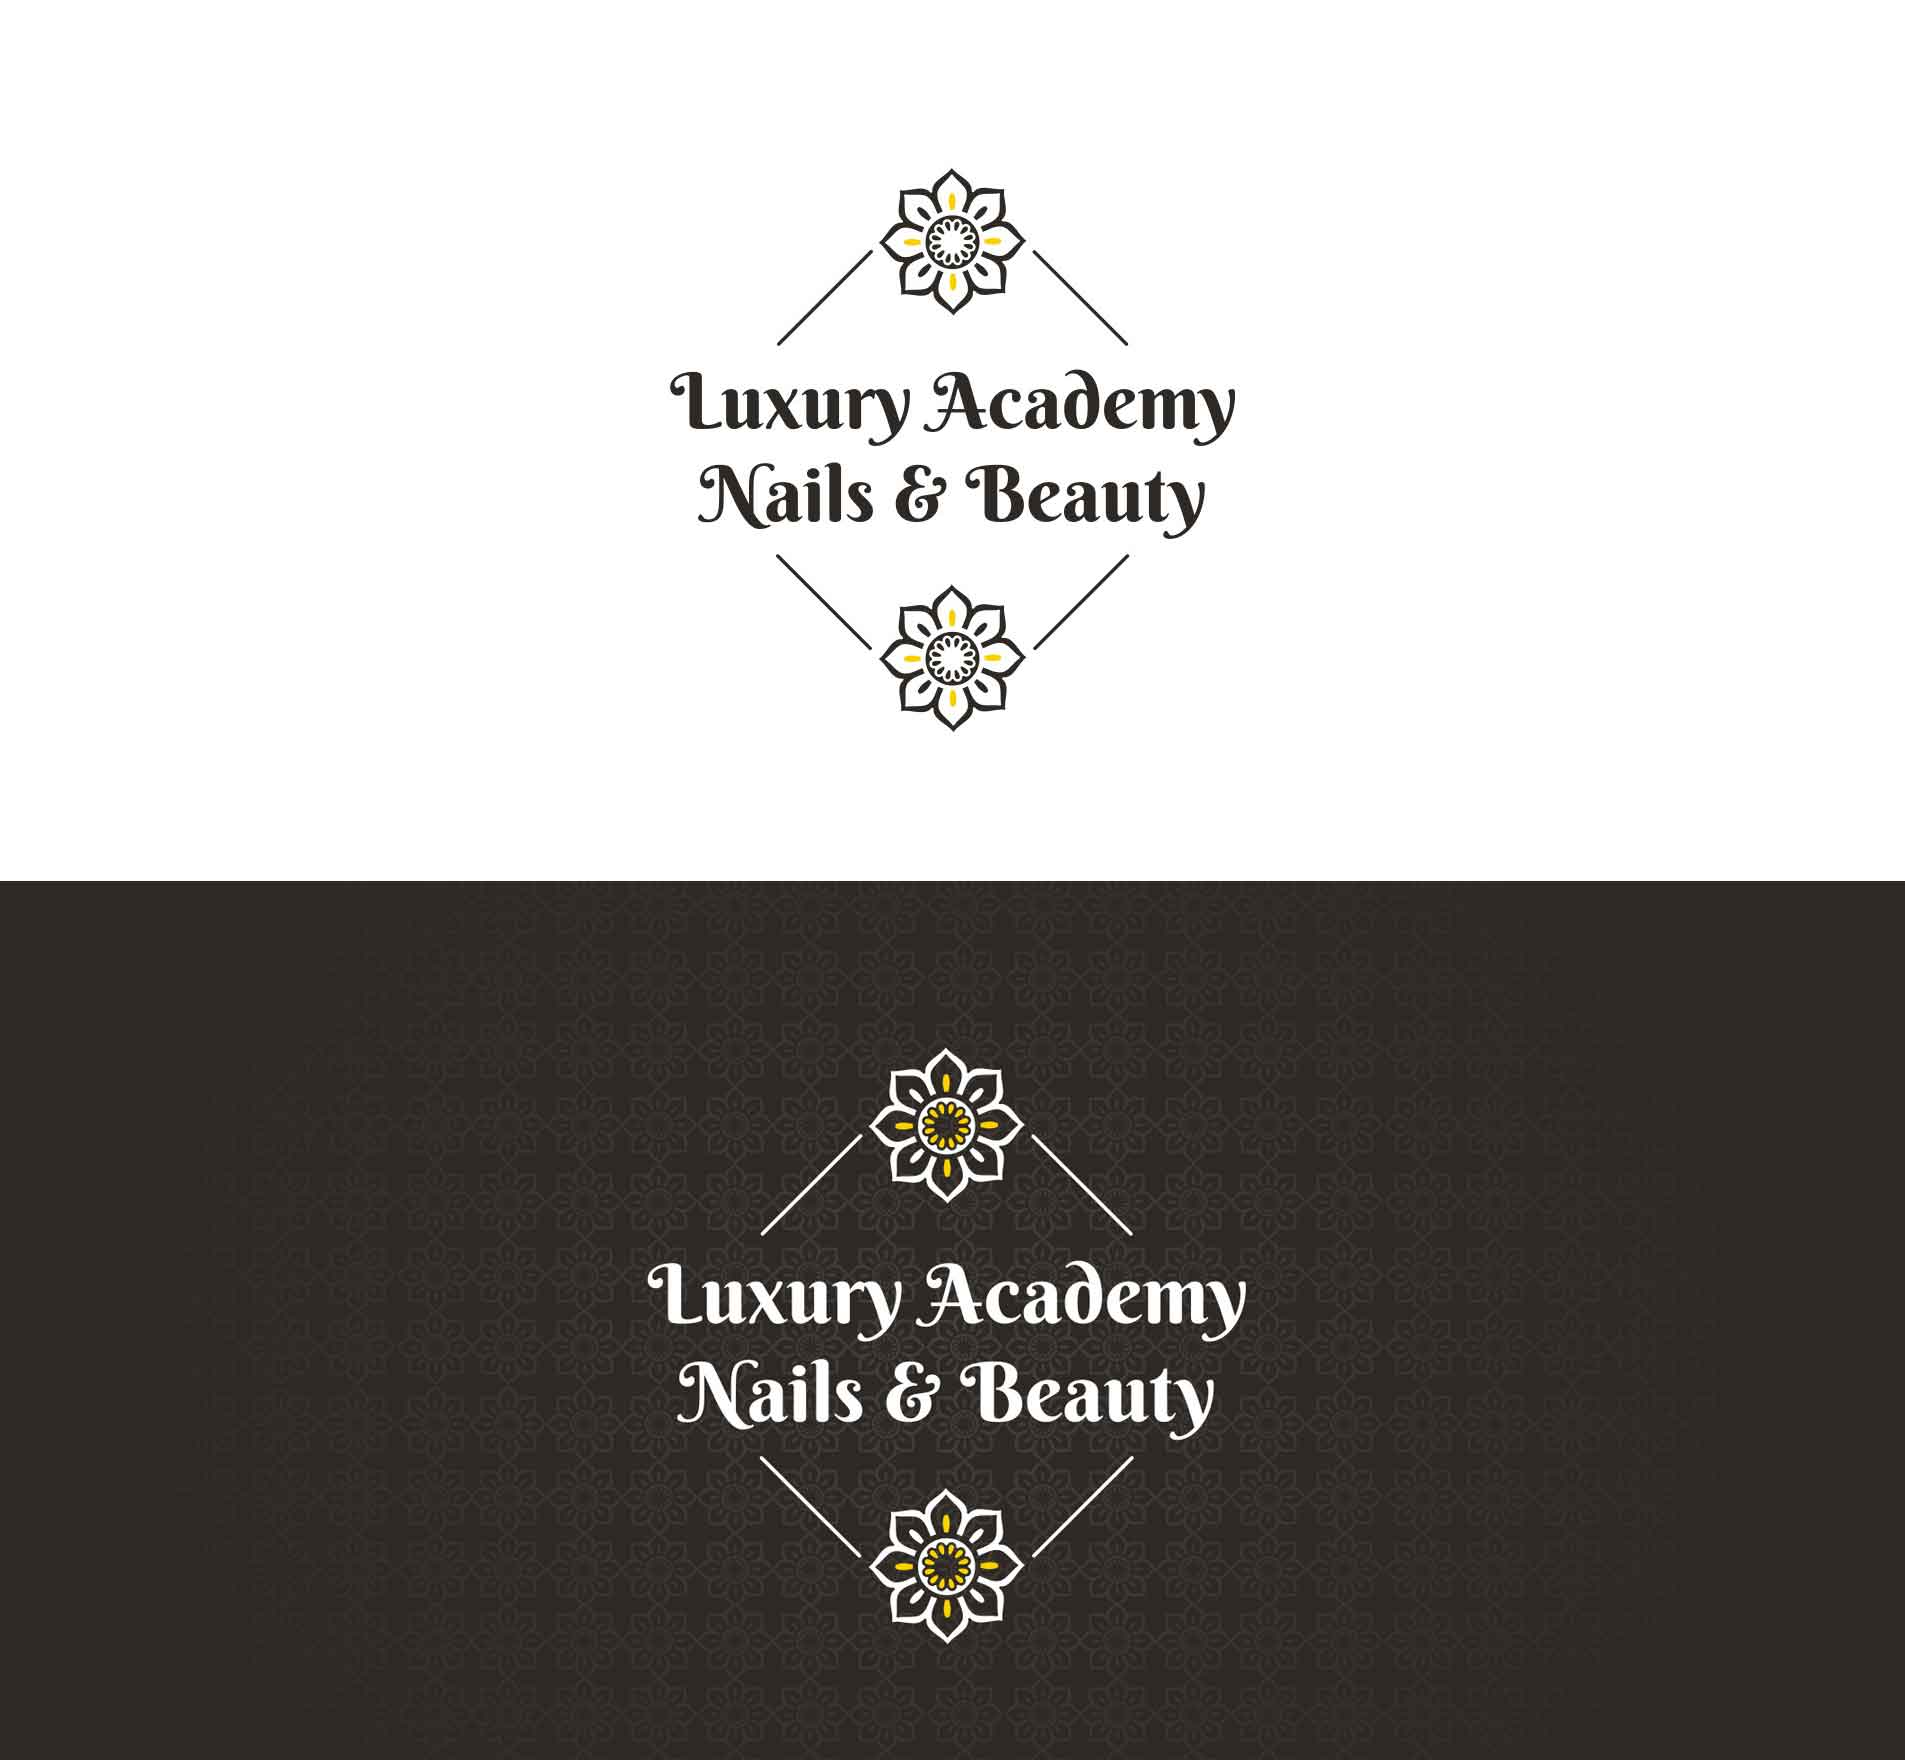 Immagine coordinata logo design alternativo